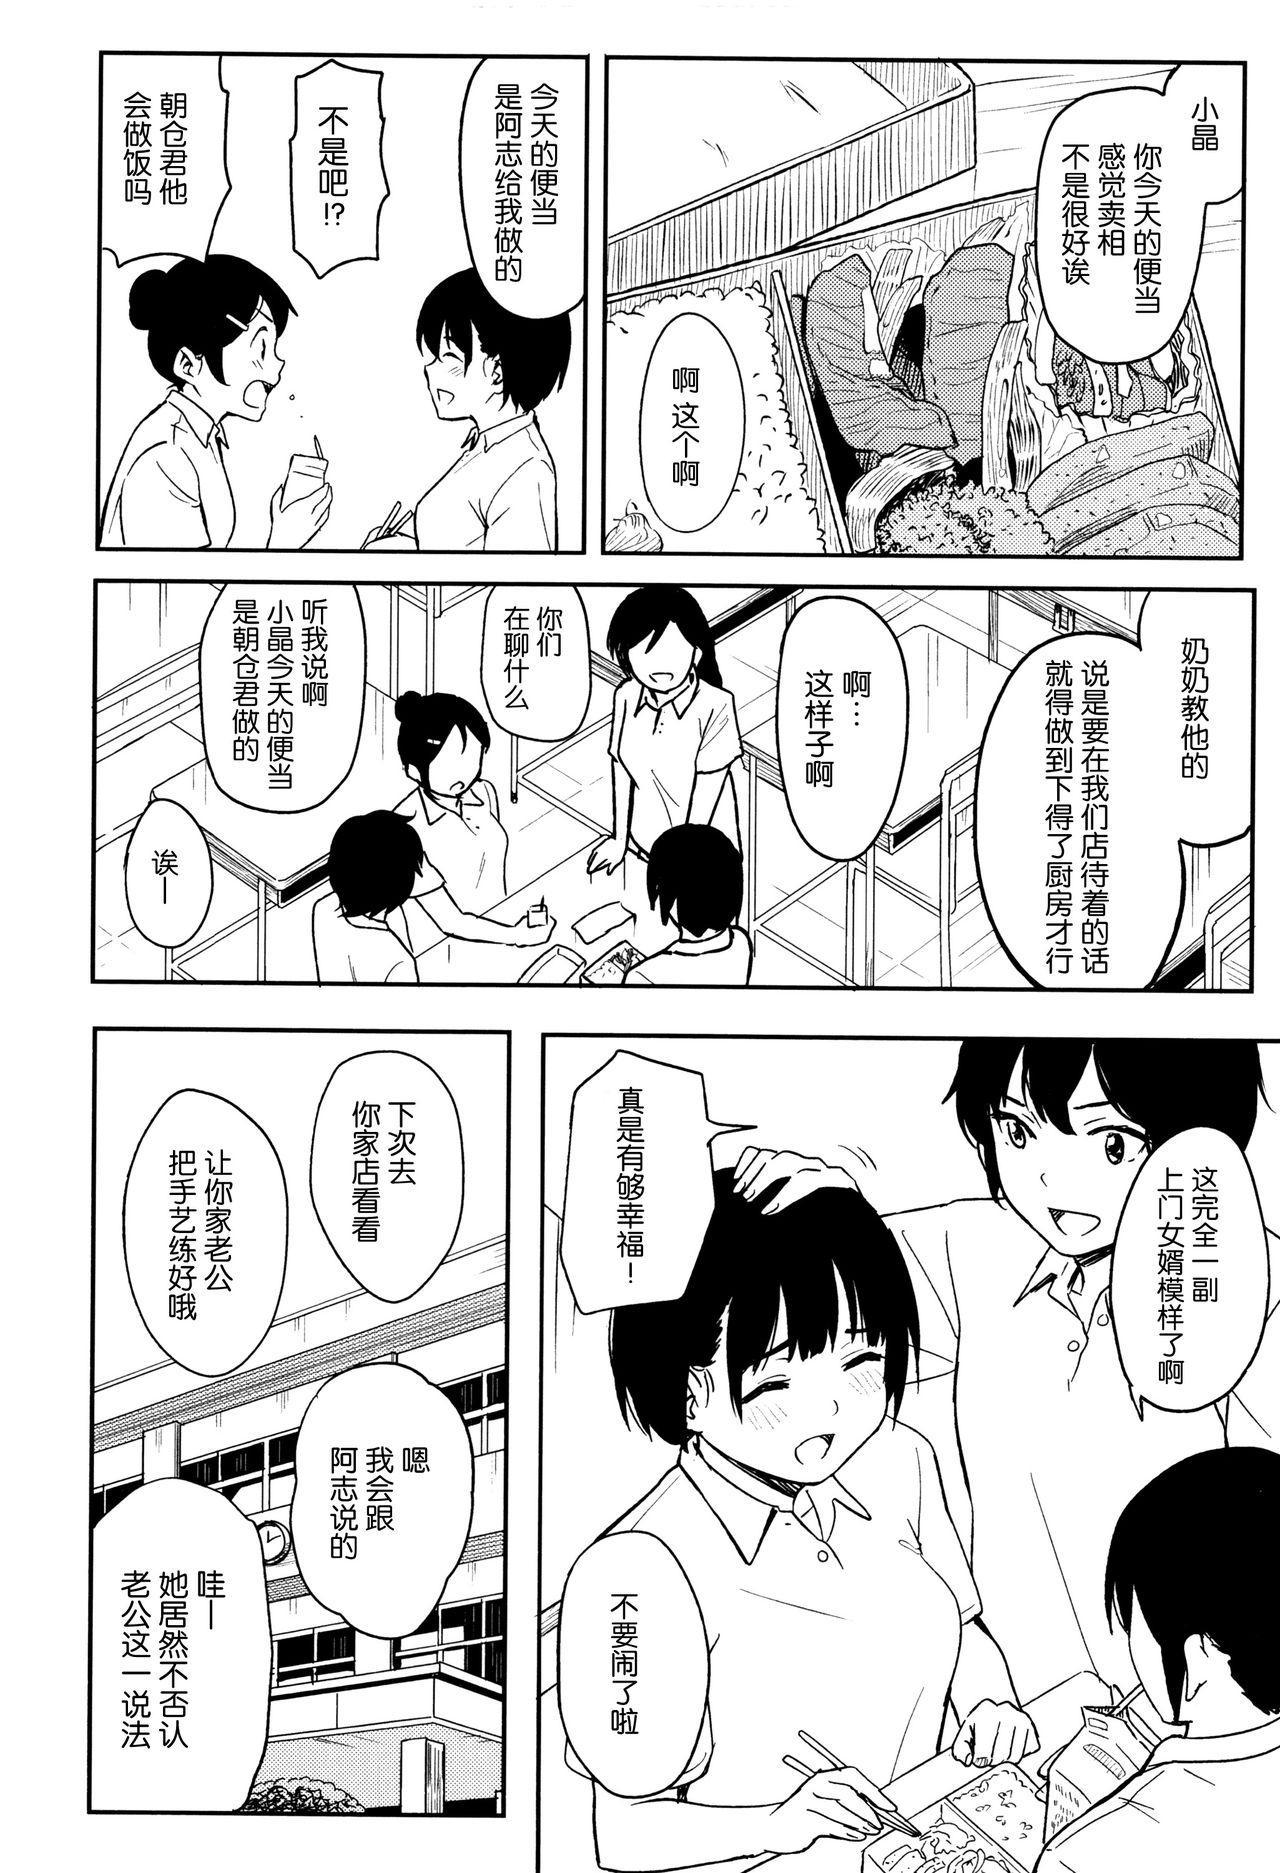 Tokubetsu na Mainichi - Special daily 206